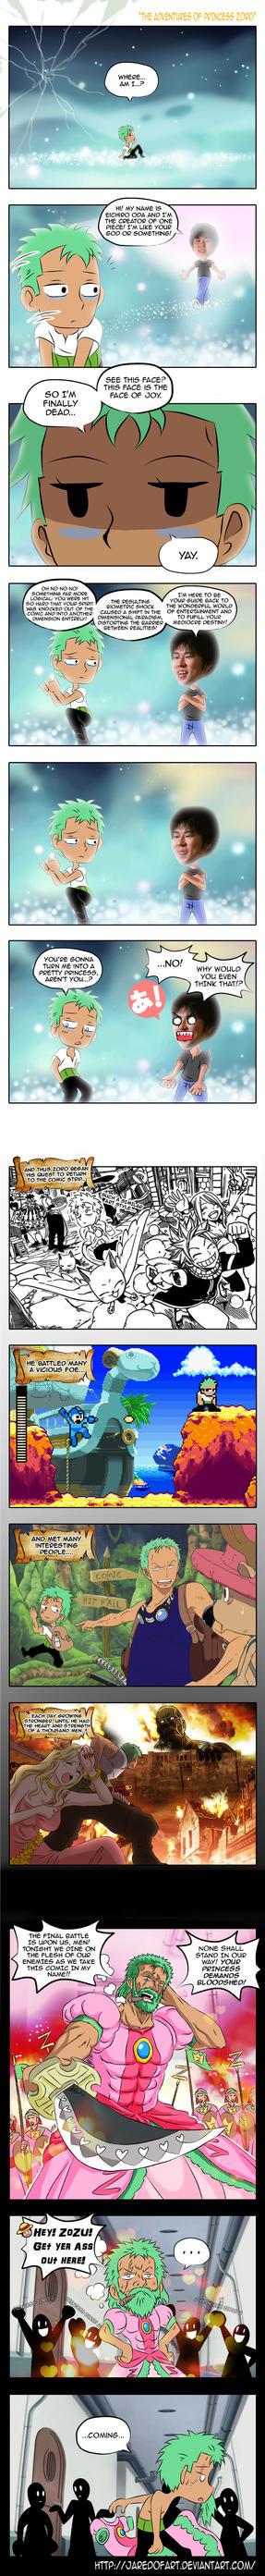 25..26..? Umm... - The Adventures of Princess Zoro by JaredofArt